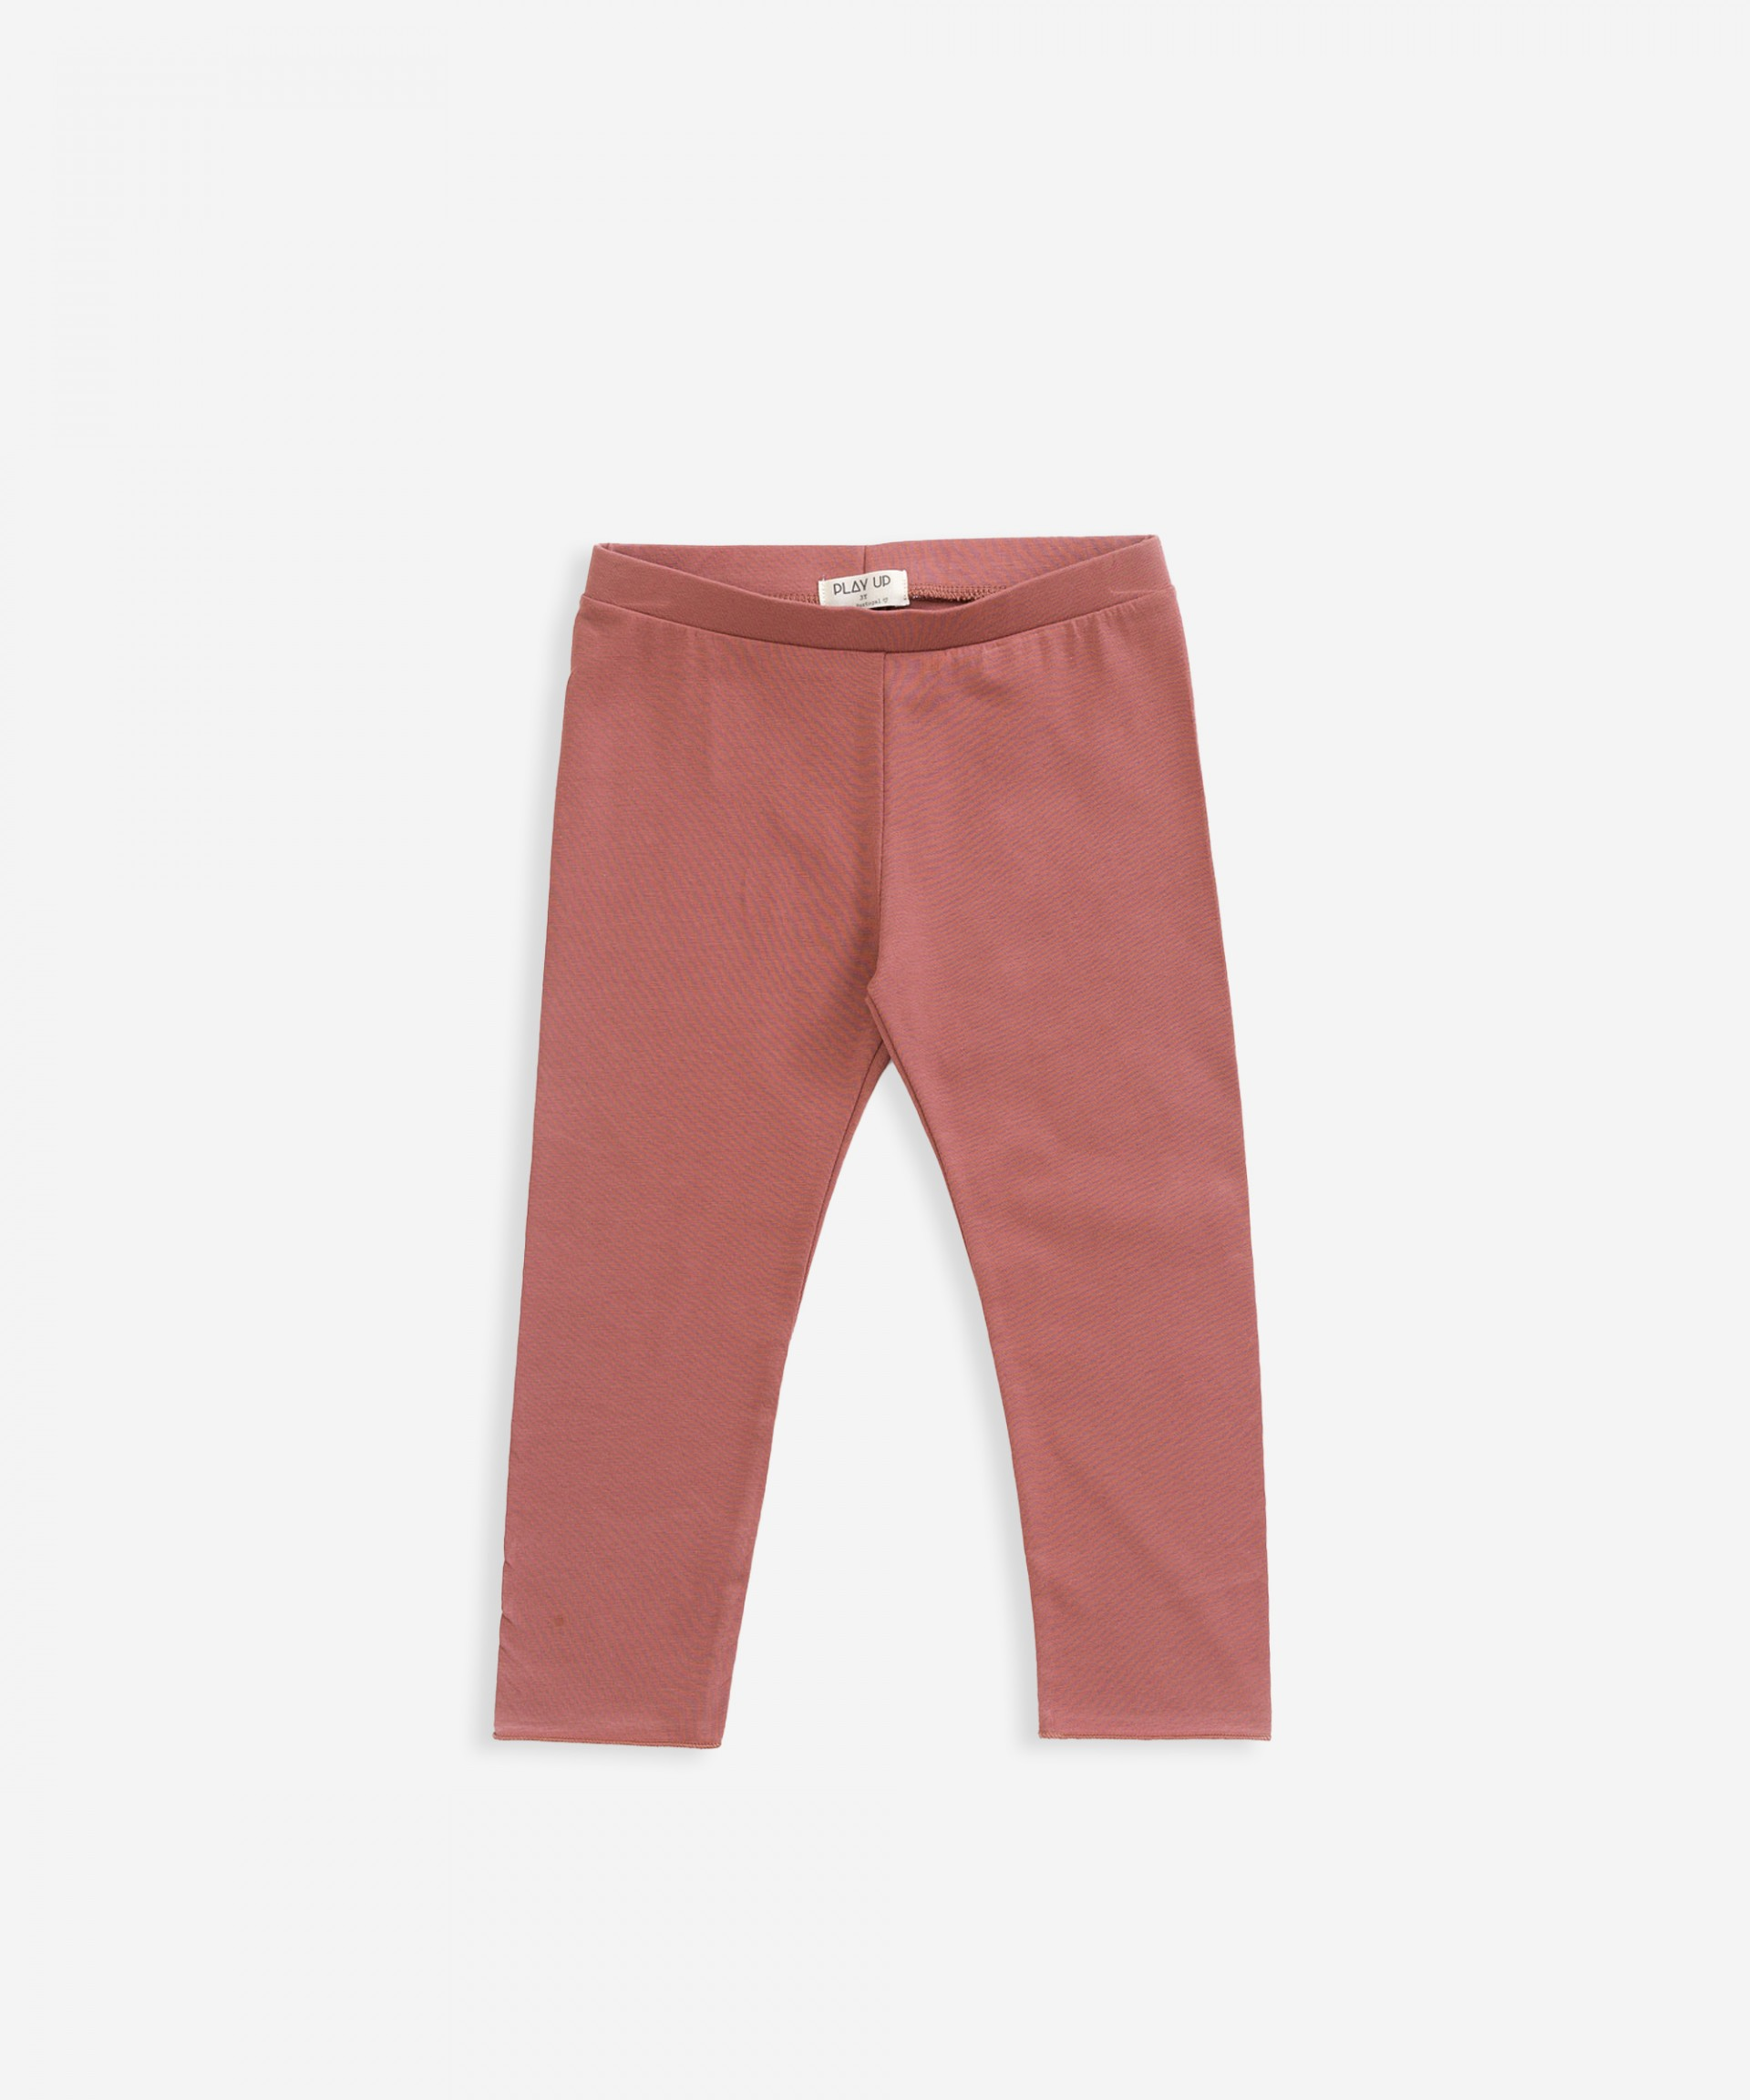 Leggings with elasticated waist | Weaving